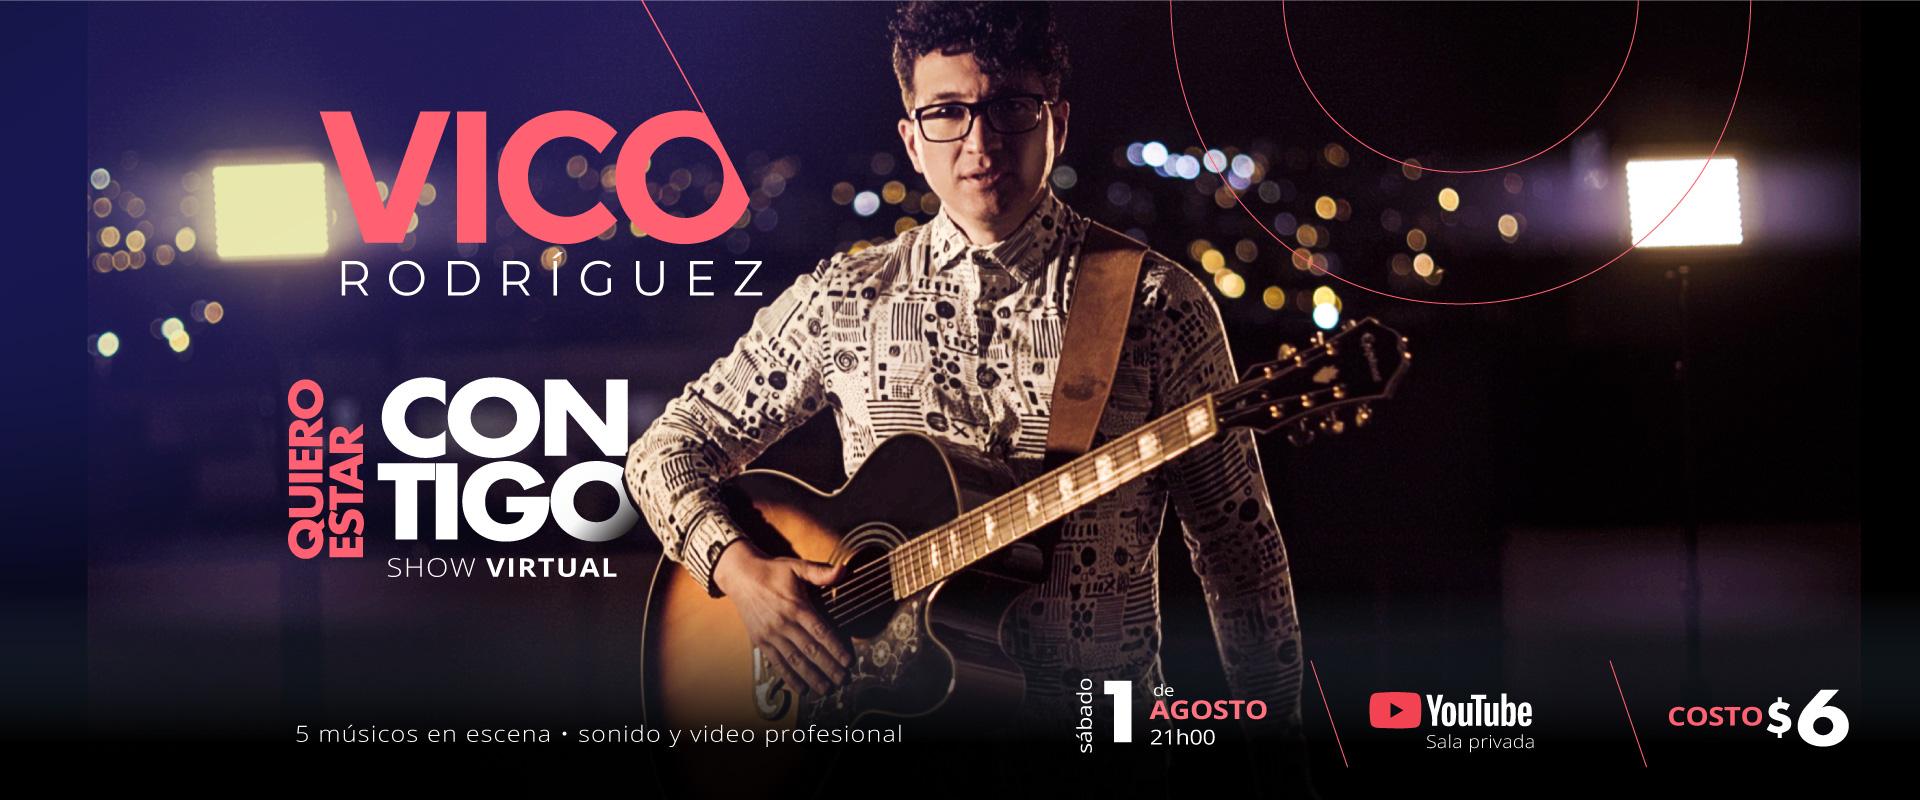 Vico-Rodriguez-1920-x-800-px